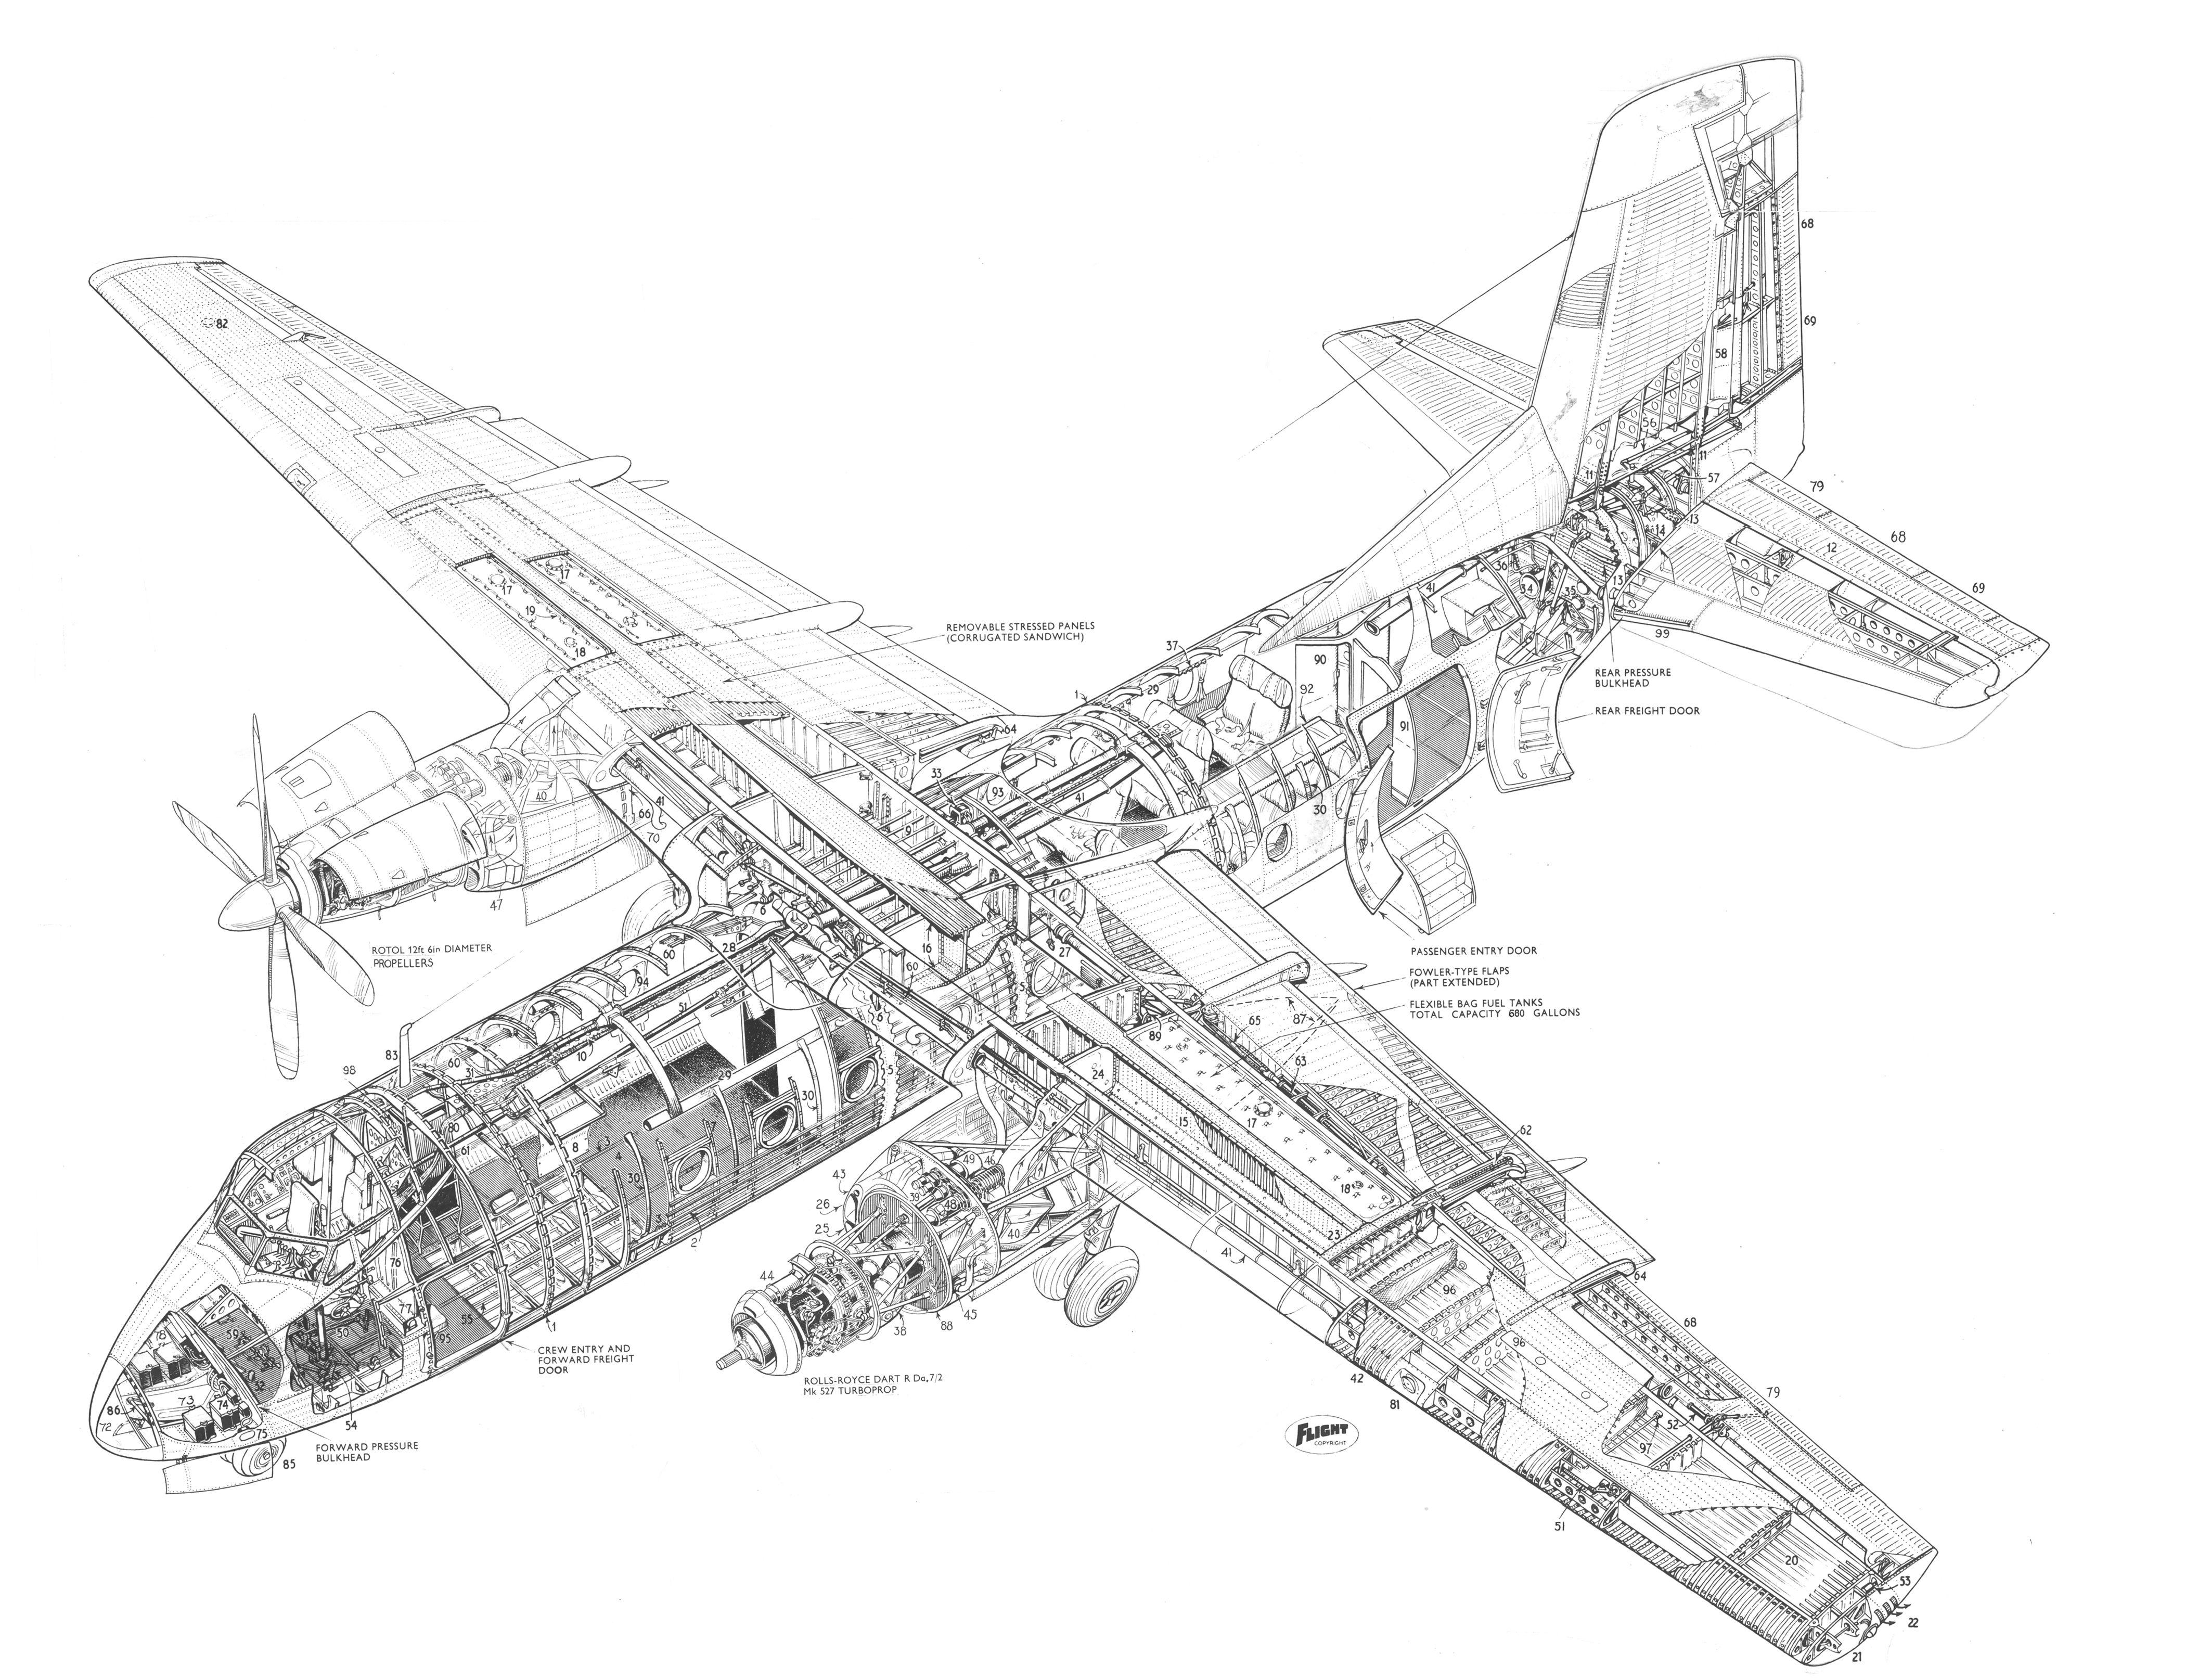 Handley Page Dart Herlad Cutaway Drawing